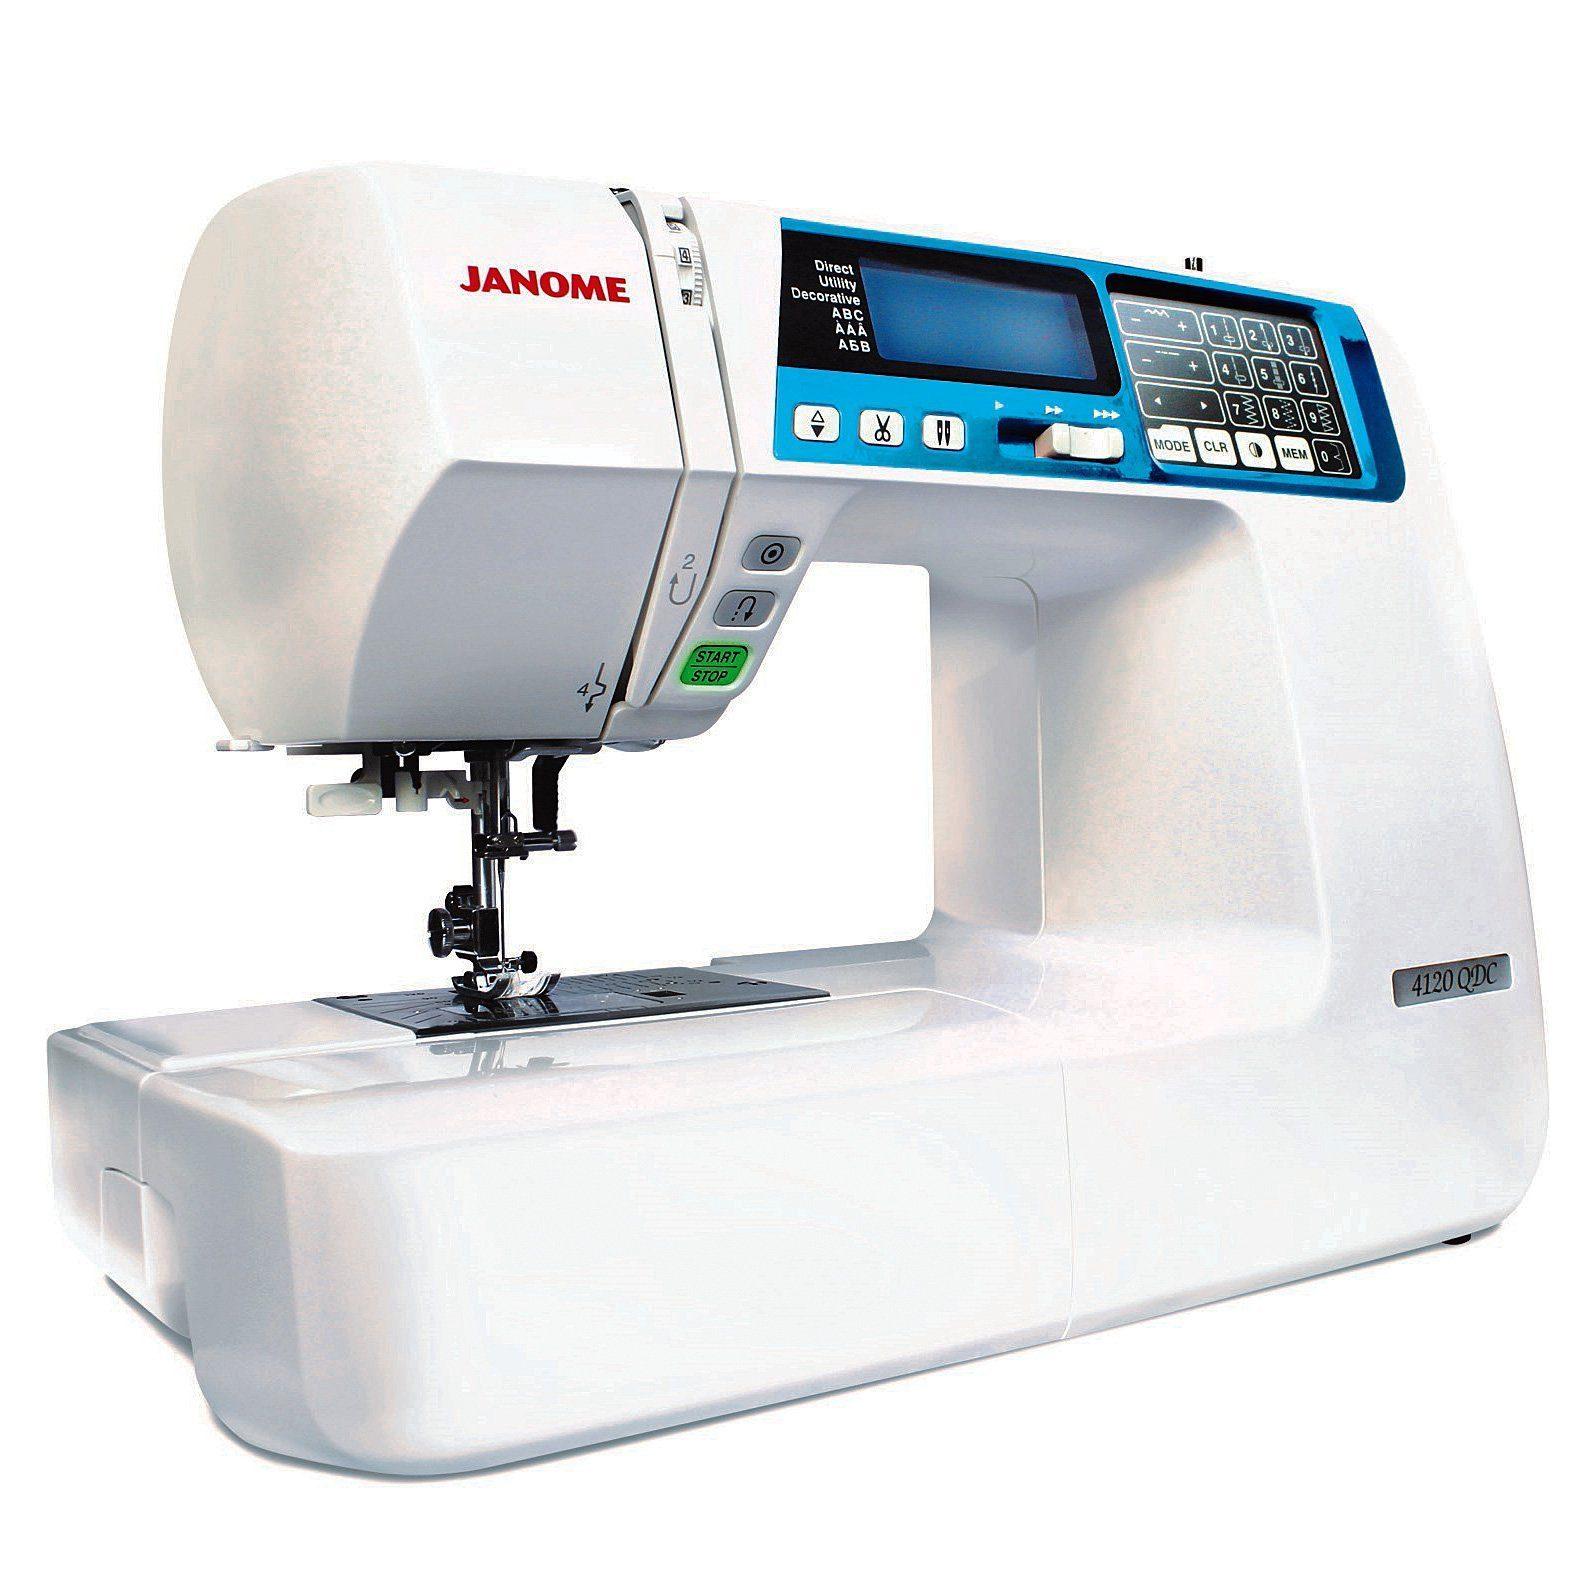 Janome 4120QDC Computerized Sewing Machine